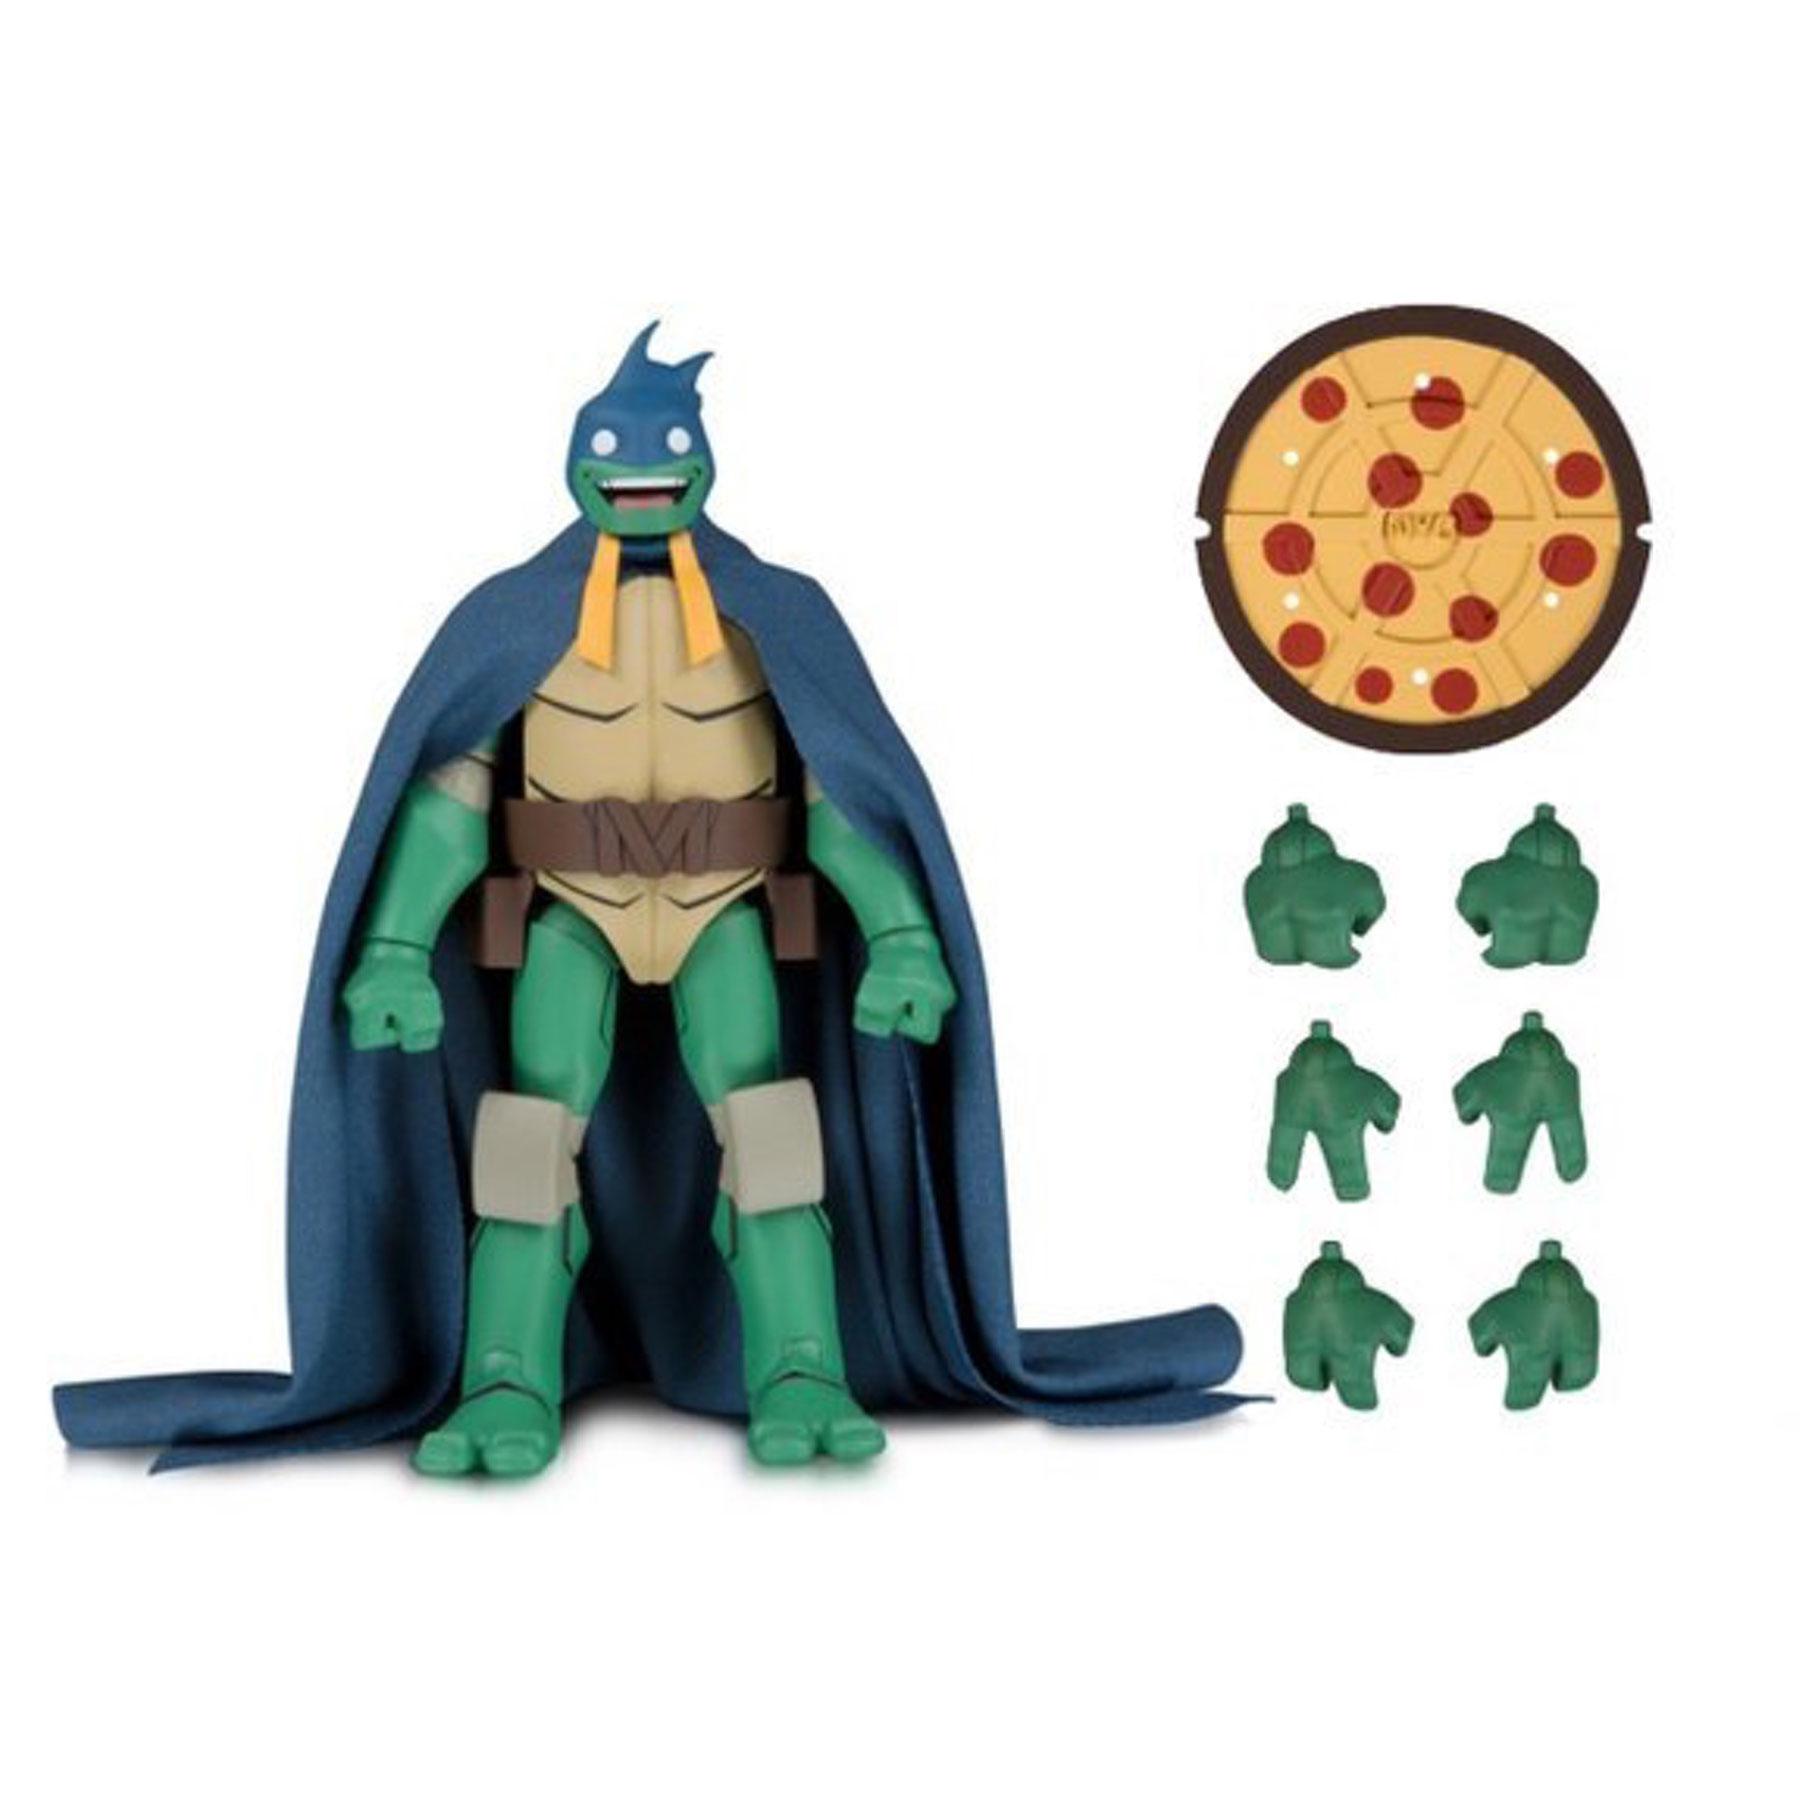 Michelangelo as Batman